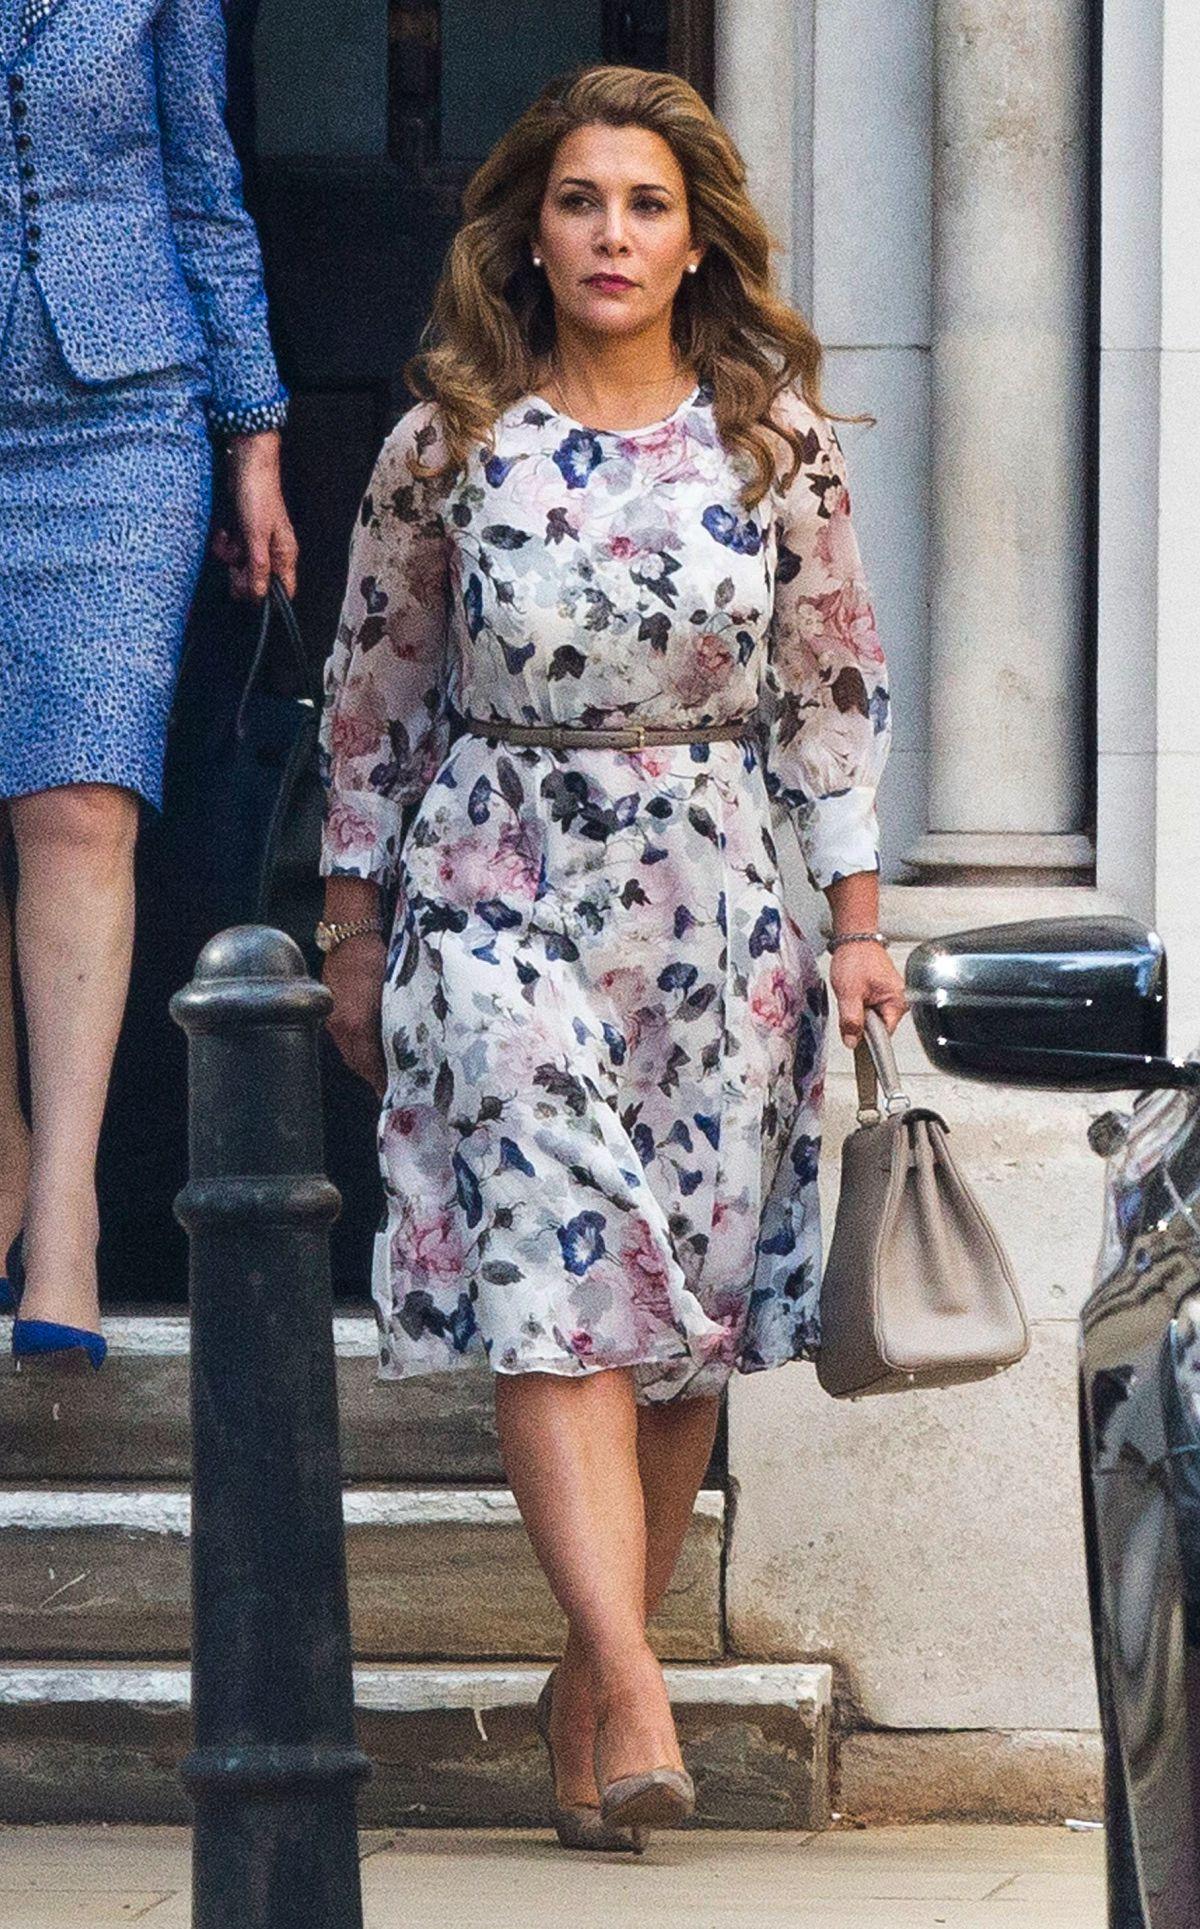 PRINCESS HAYA BINT AL HUSSEIN Arrives at High Court in